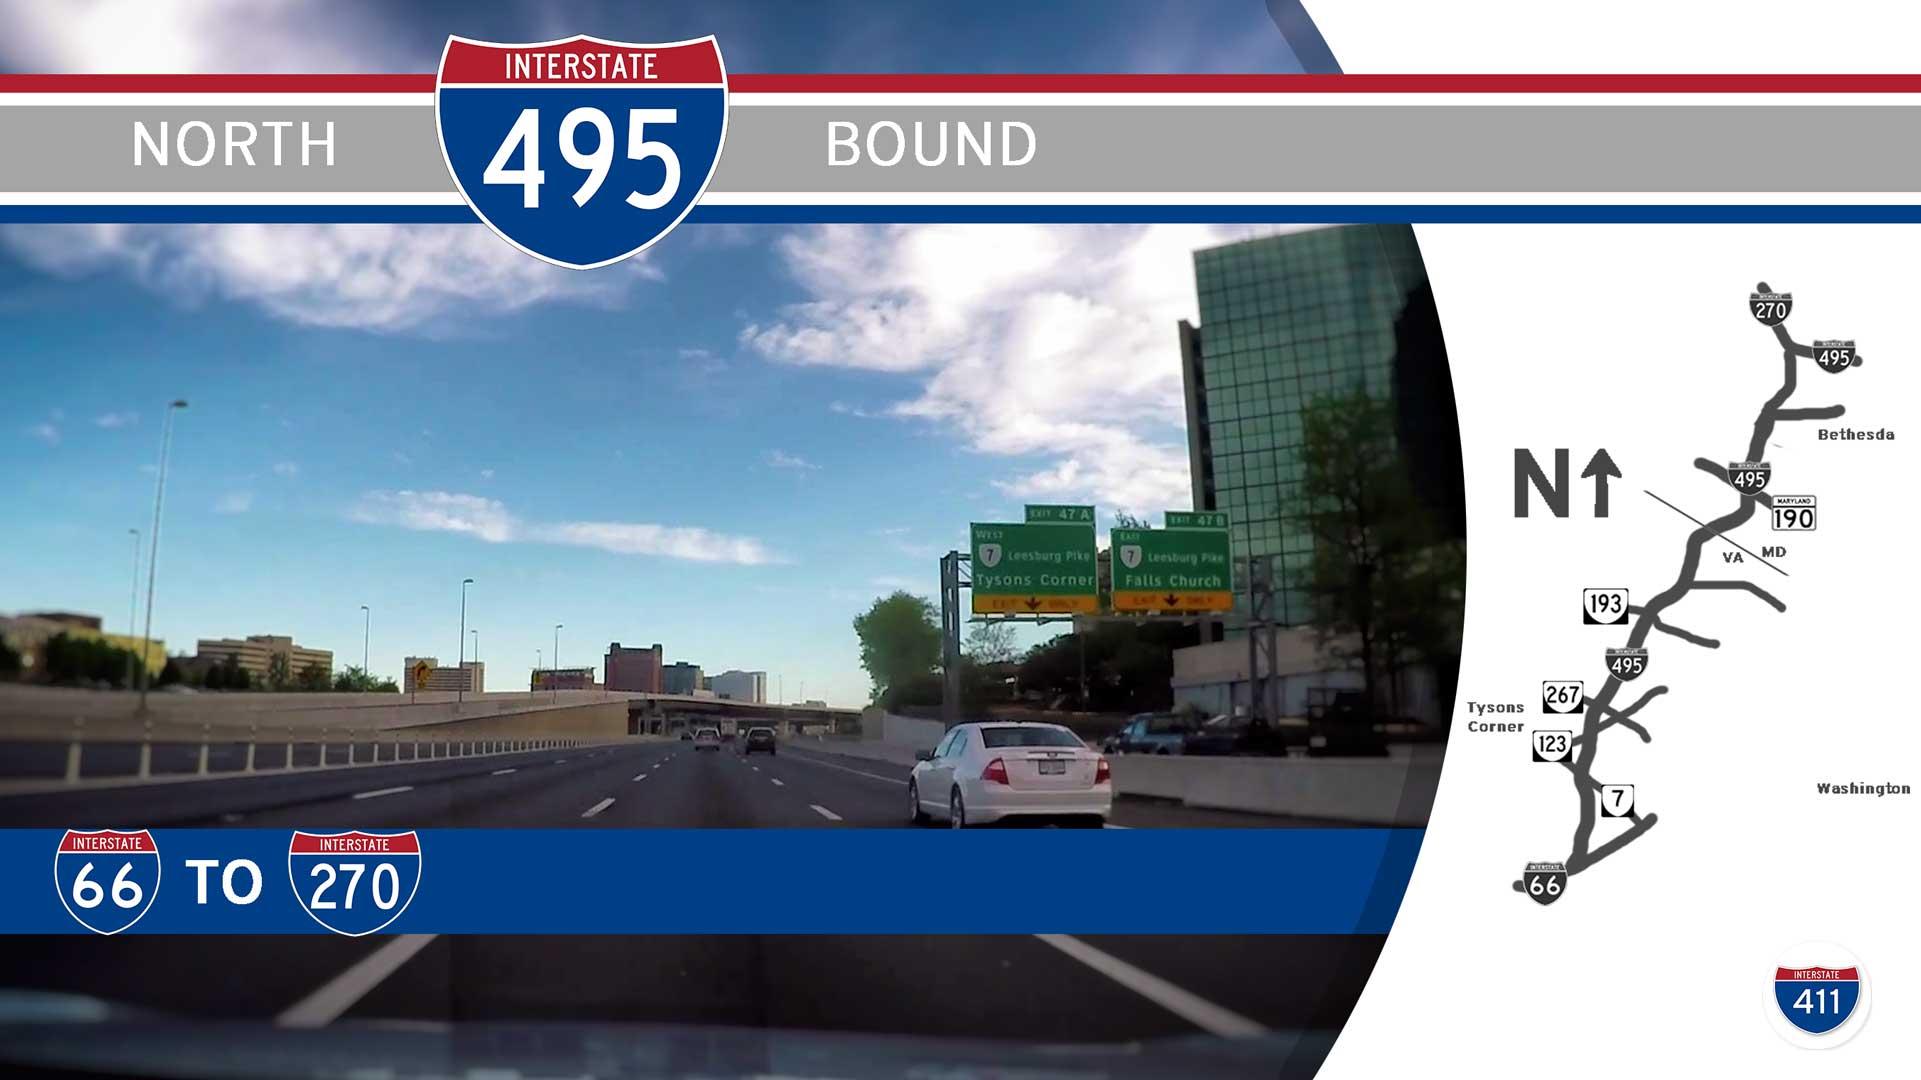 Interstate 495 - Virginia I-66 to Maryland I-270